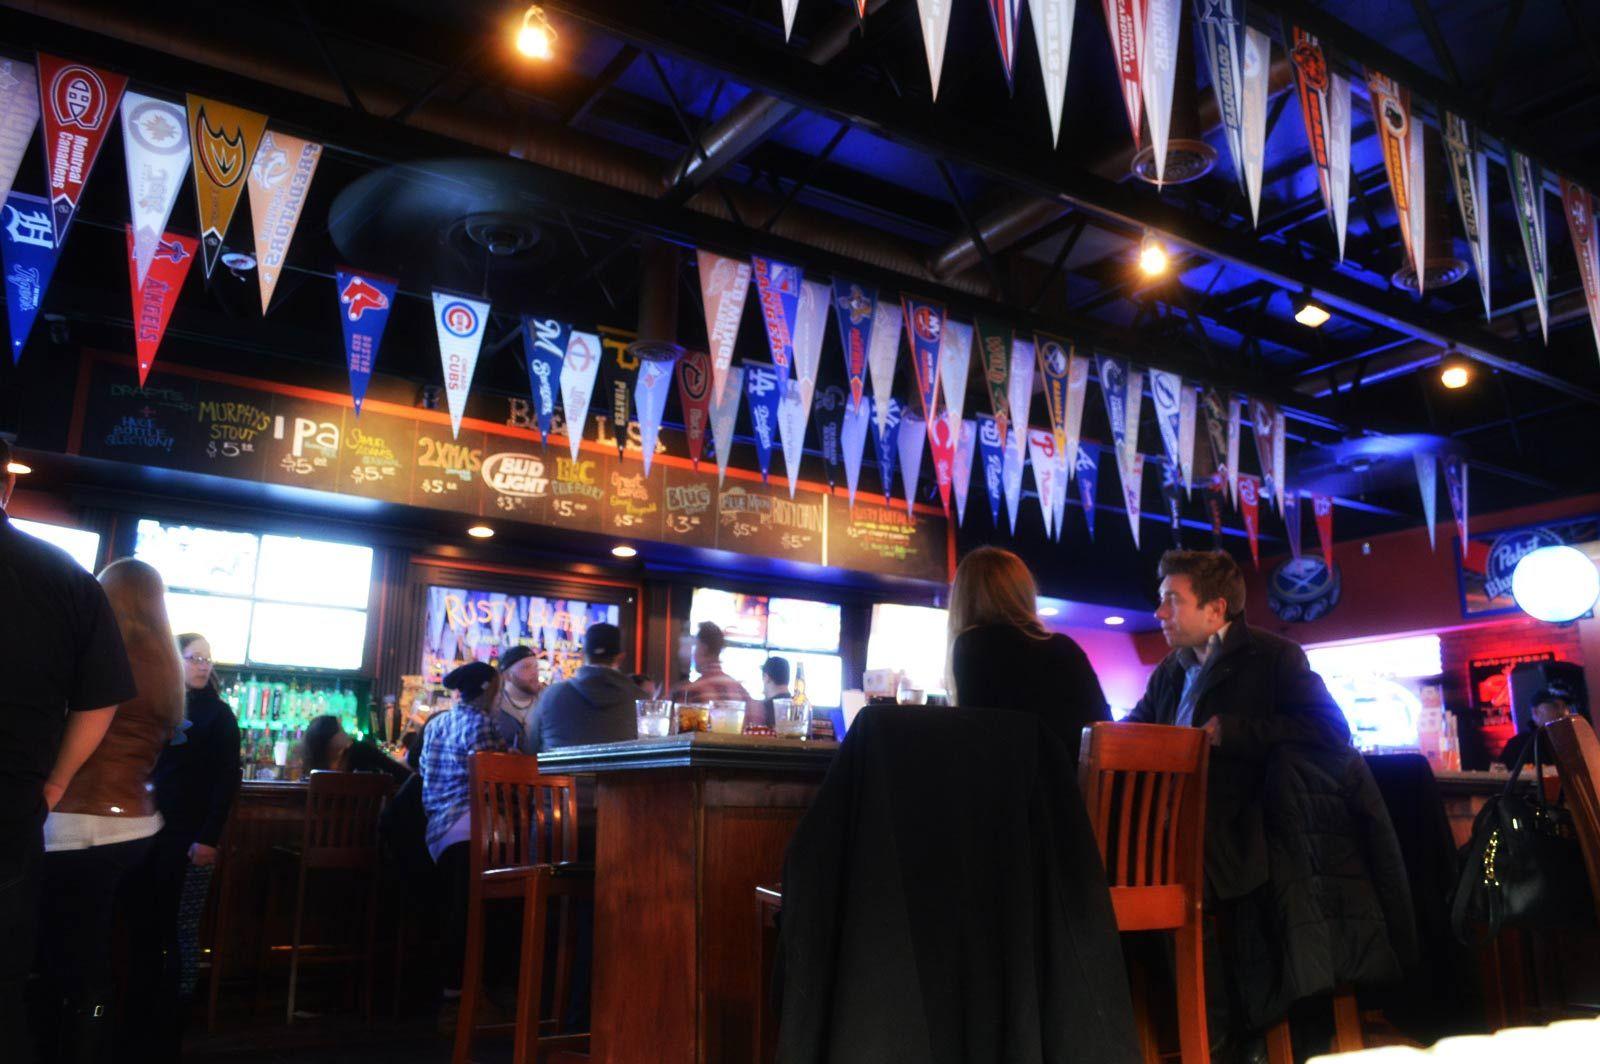 Rusty Buffalo Pub West Seneca Bar Restaurants Diners